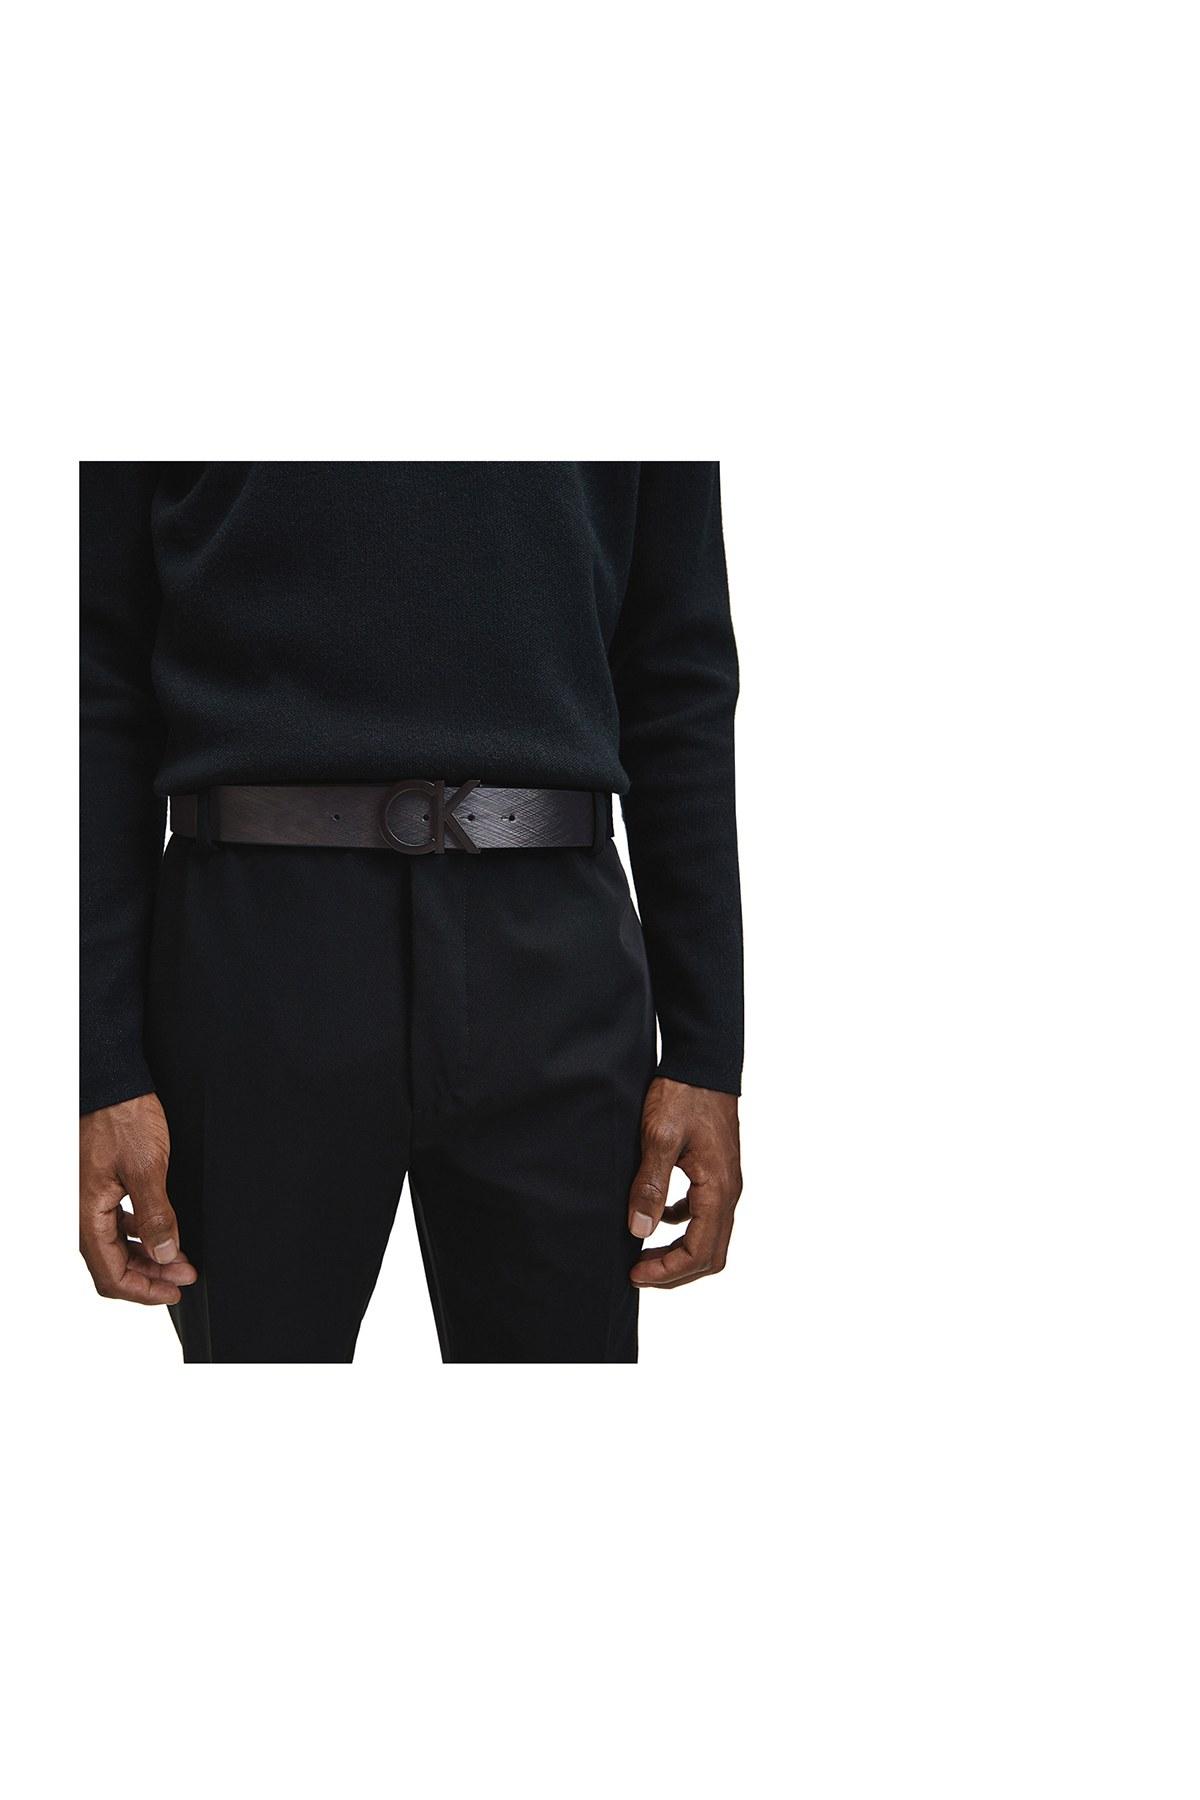 Calvin Klein Deri Erkek Kemer K50K506000 BAX SİYAH